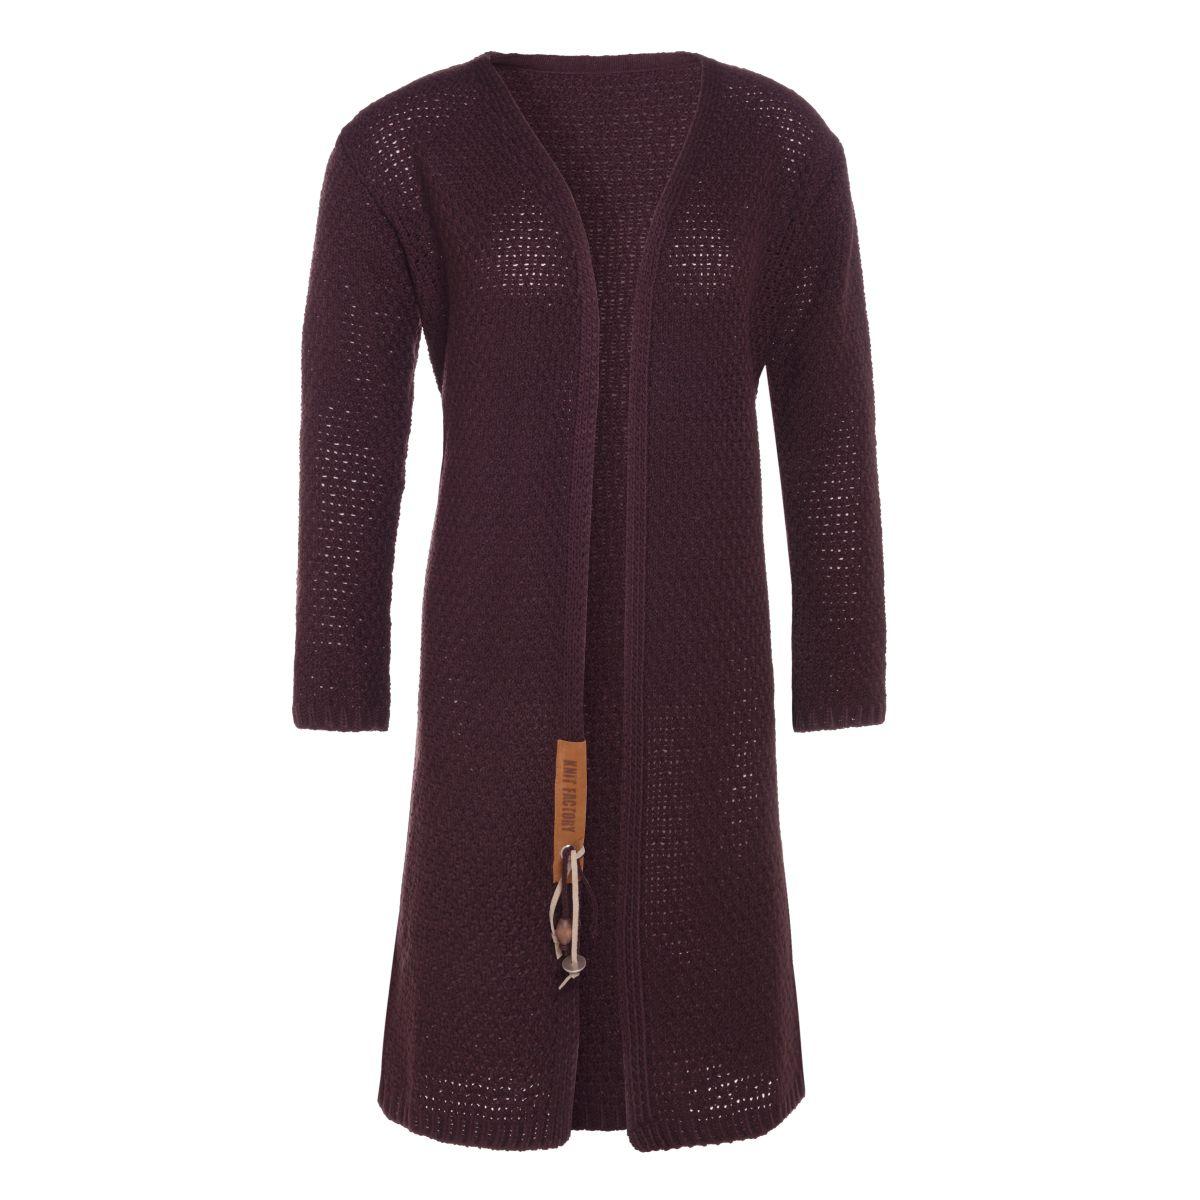 luna long knitted cardigan aubergine 5052